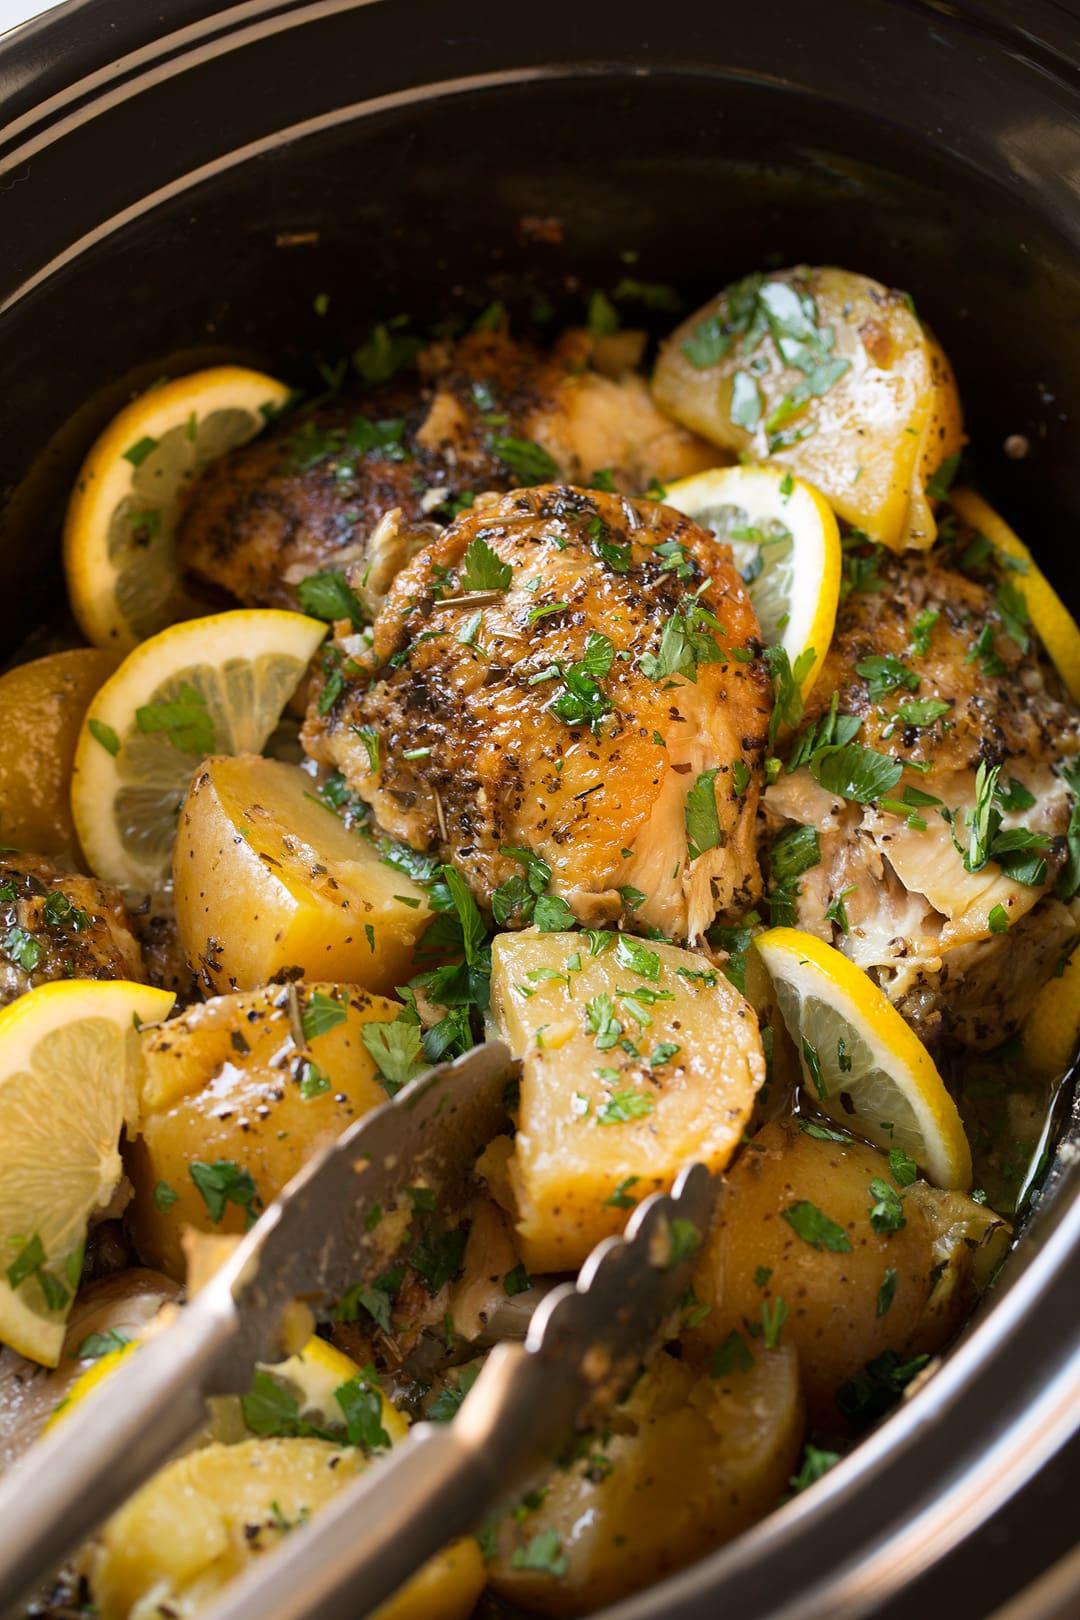 Greek Lemon-Garlic Chicken Thighs and Potatoes Virginia Vohasek